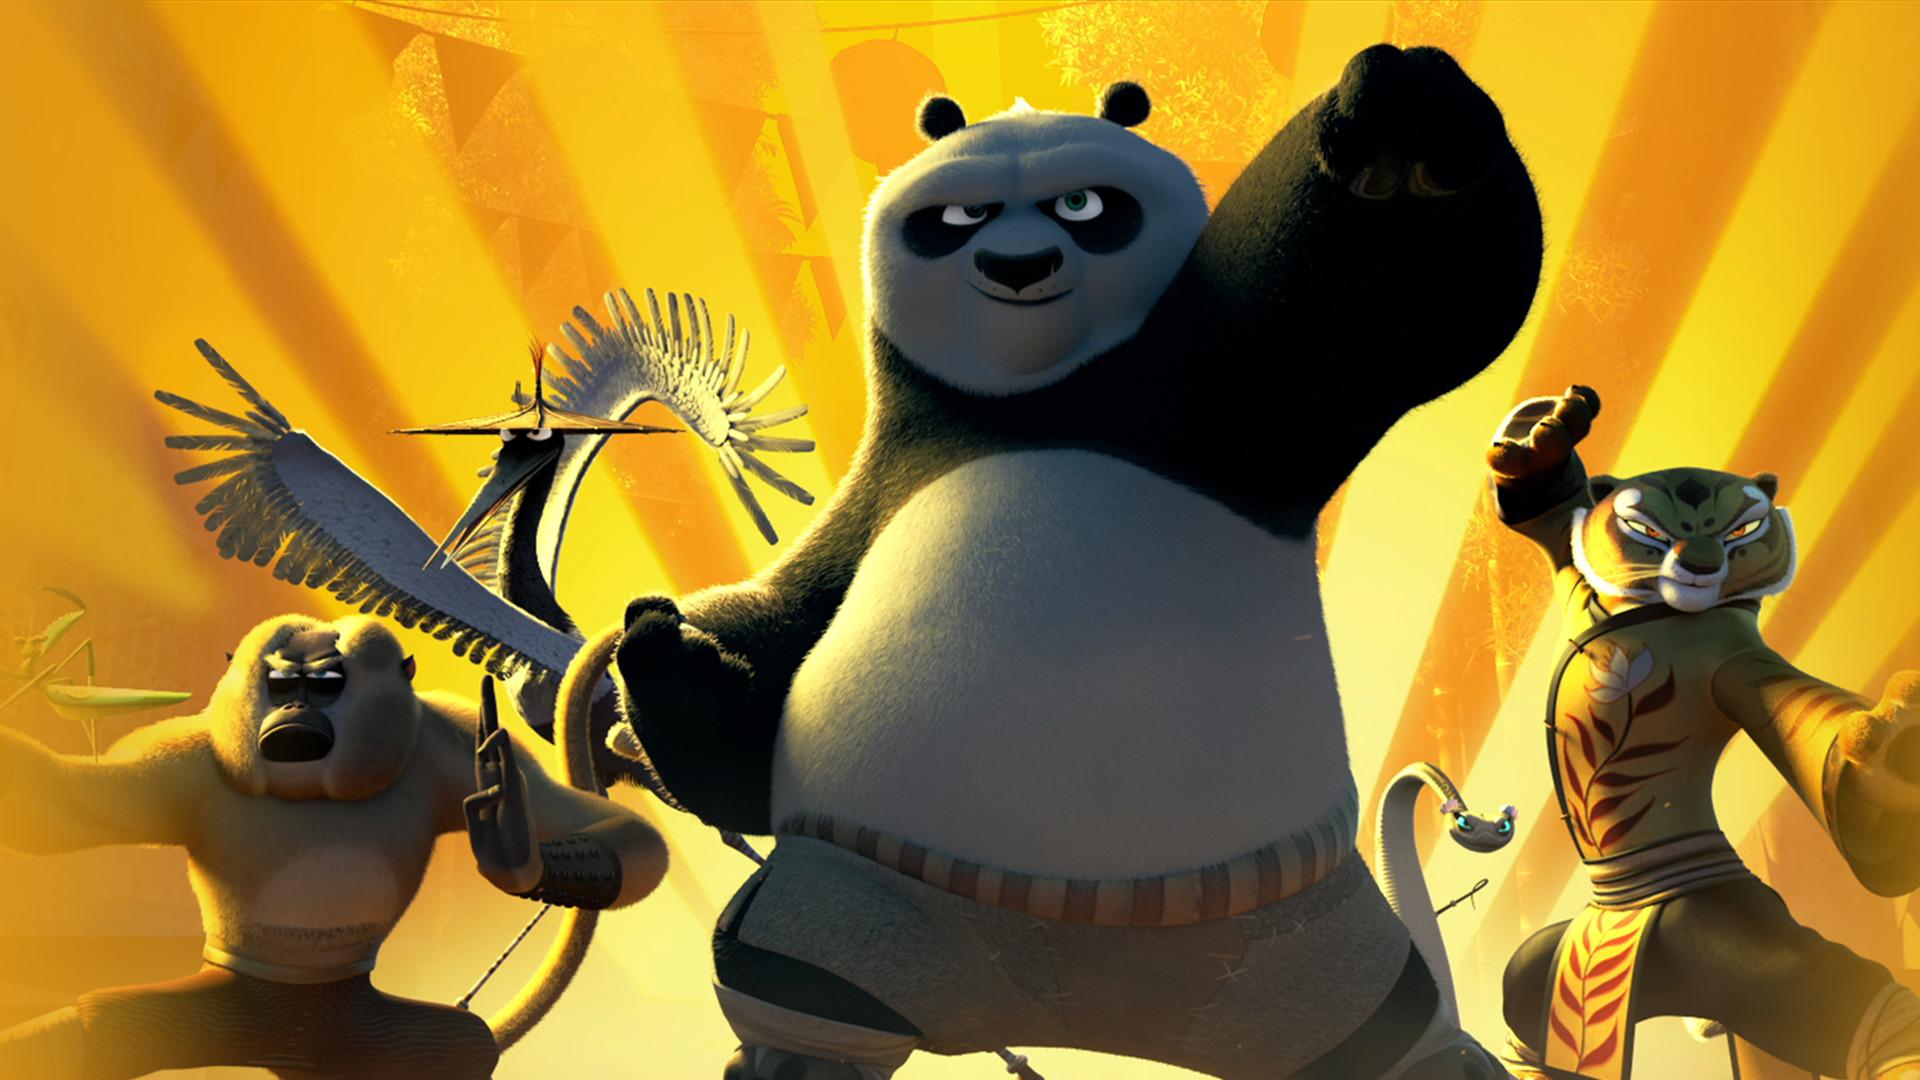 Kung fu panda 3 fond d 39 cran hd arri re plan 1920x1080 - Kung fu panda 3 telecharger ...